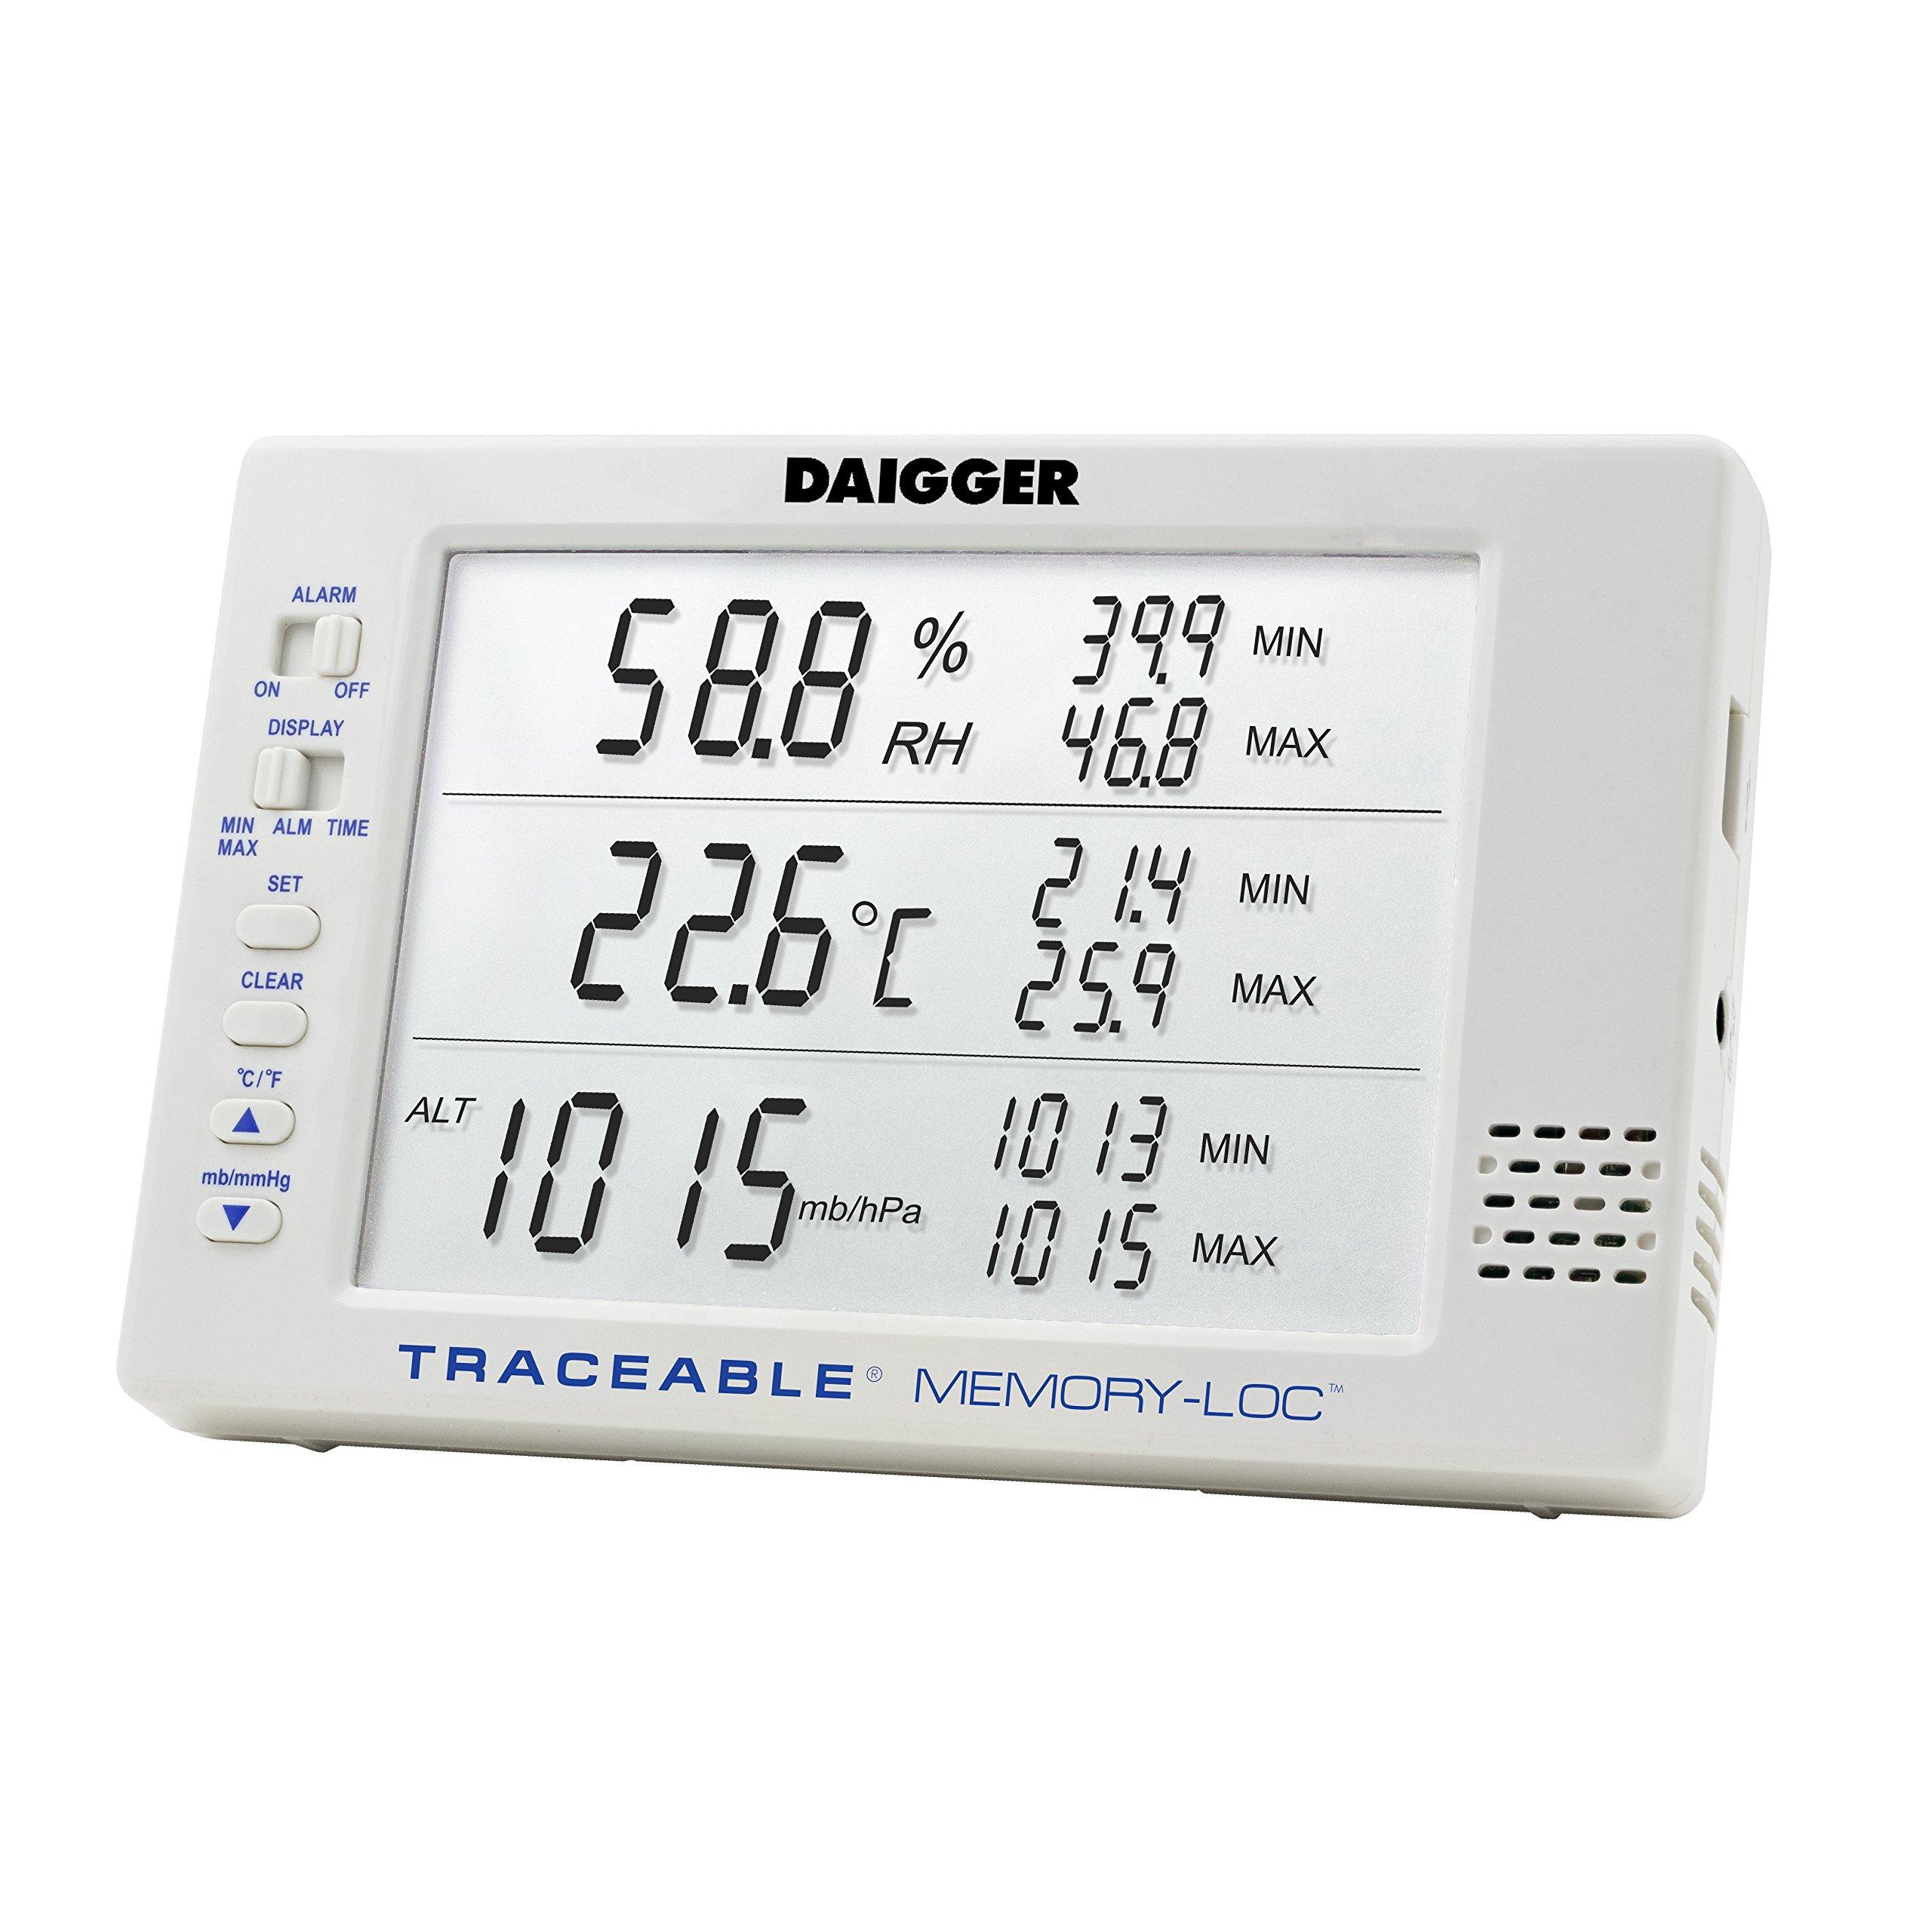 Daigger Traceable Memory-Loc Datalogging Barometer